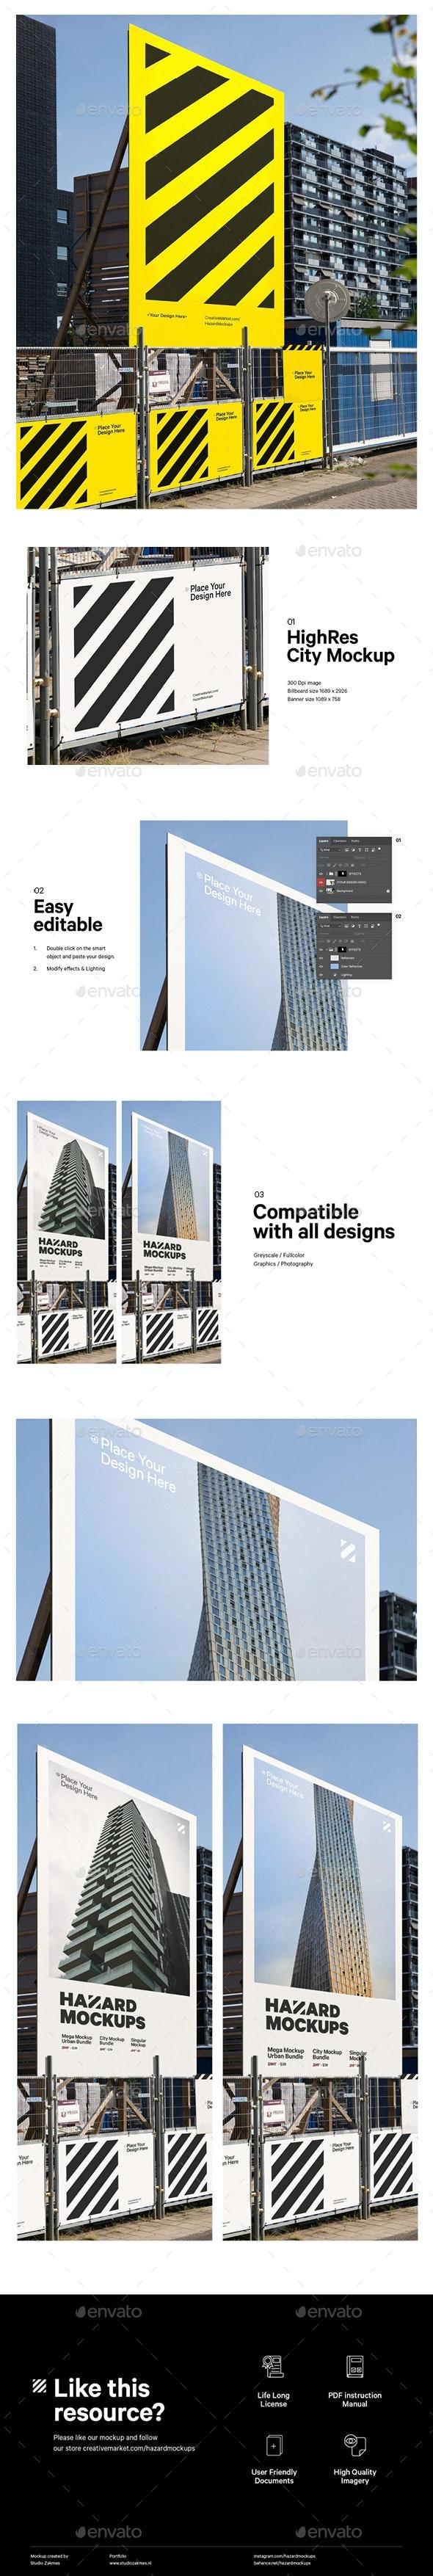 City Construction Mockup - Posters Print